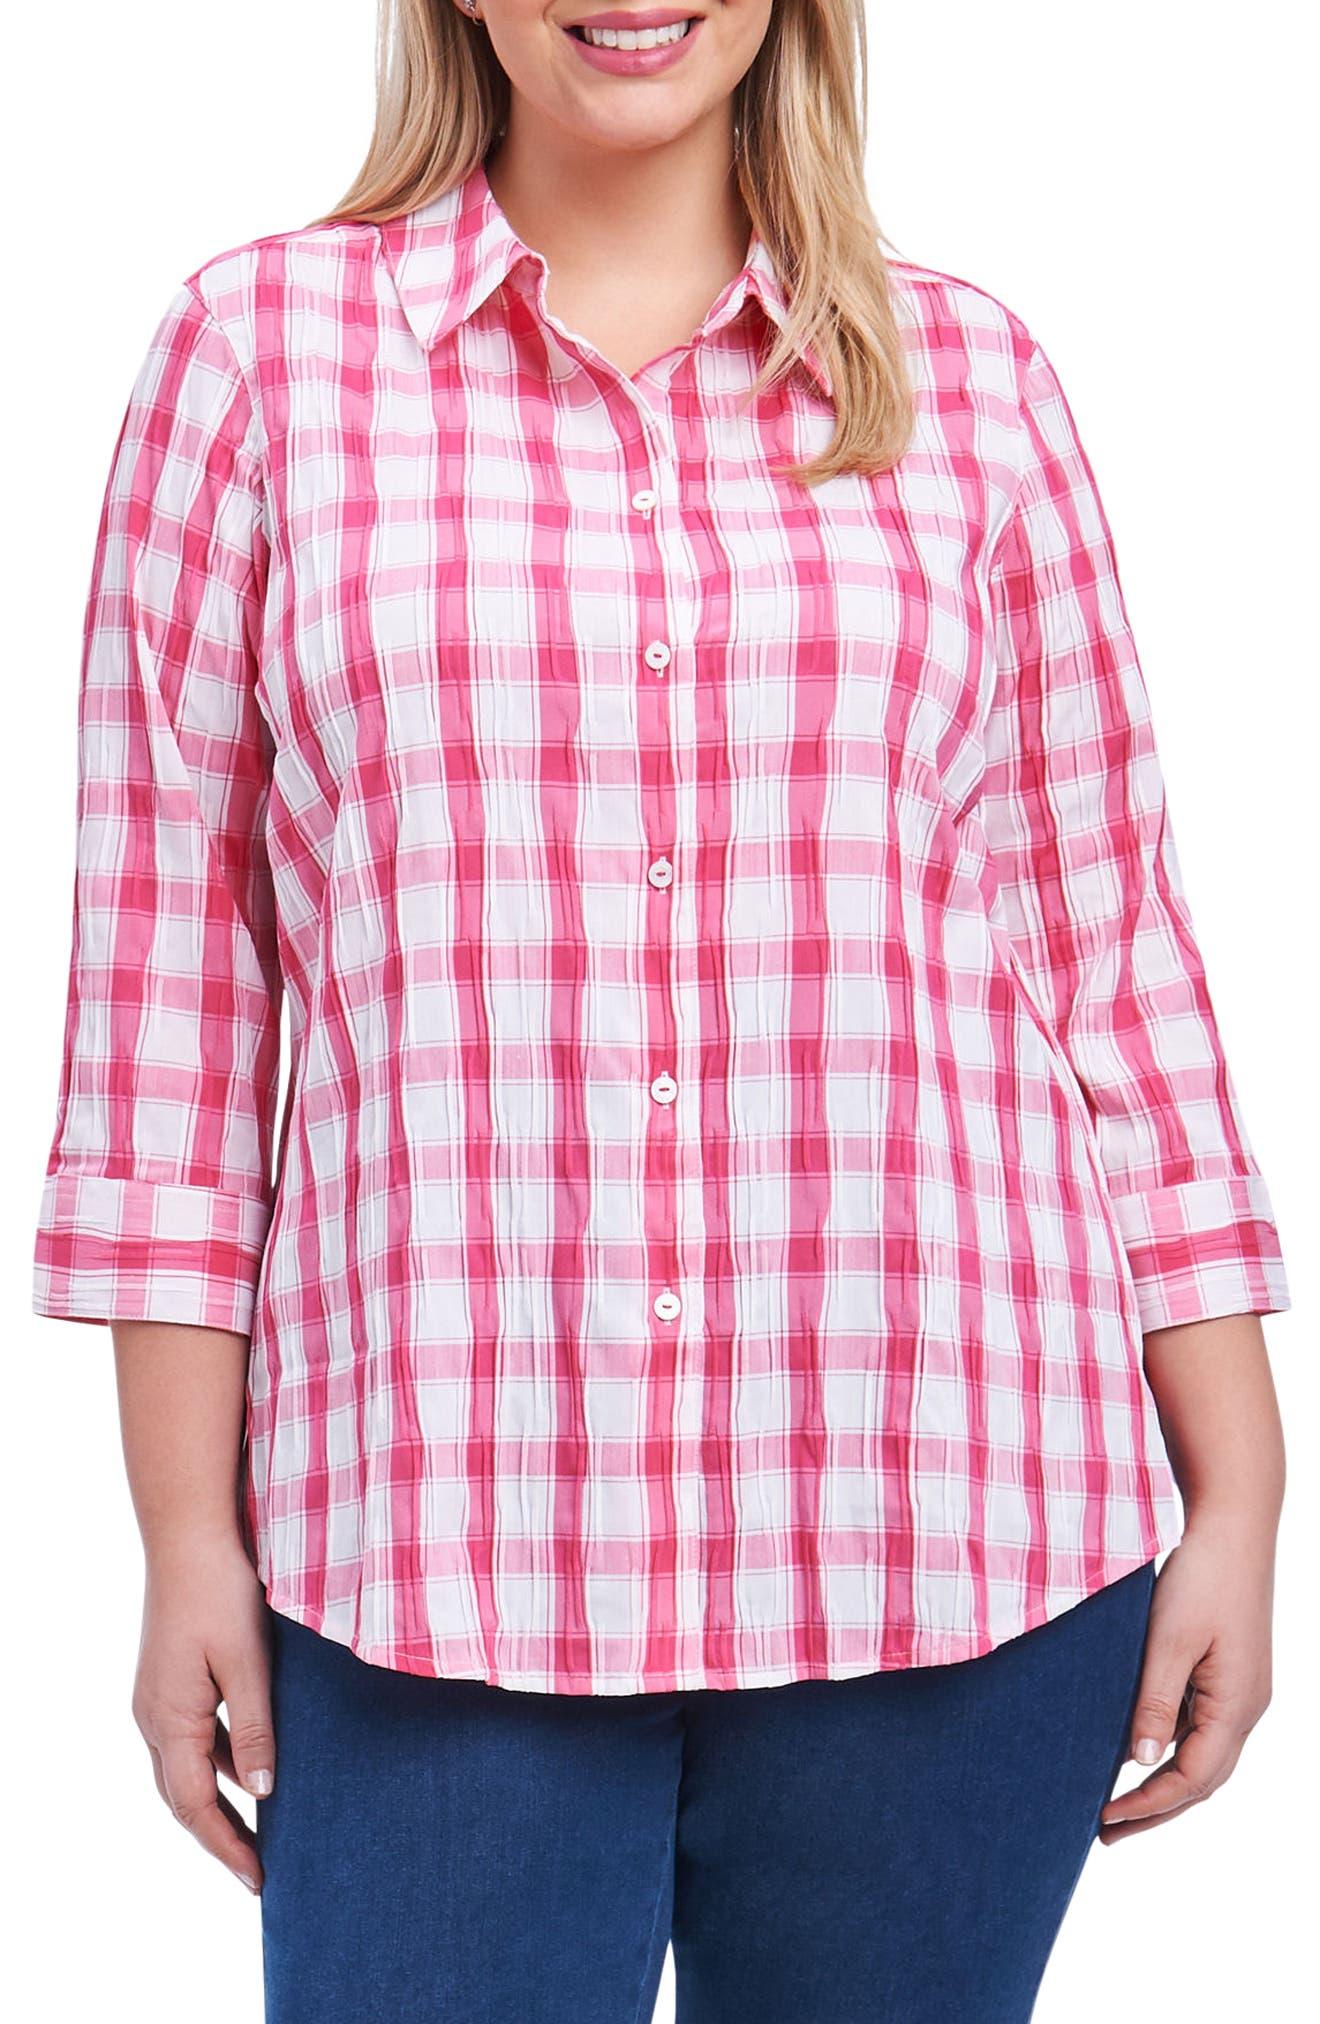 Main Image - Foxcroft Sue Shaped Fit Crinkle Plaid Shirt (Plus Size)